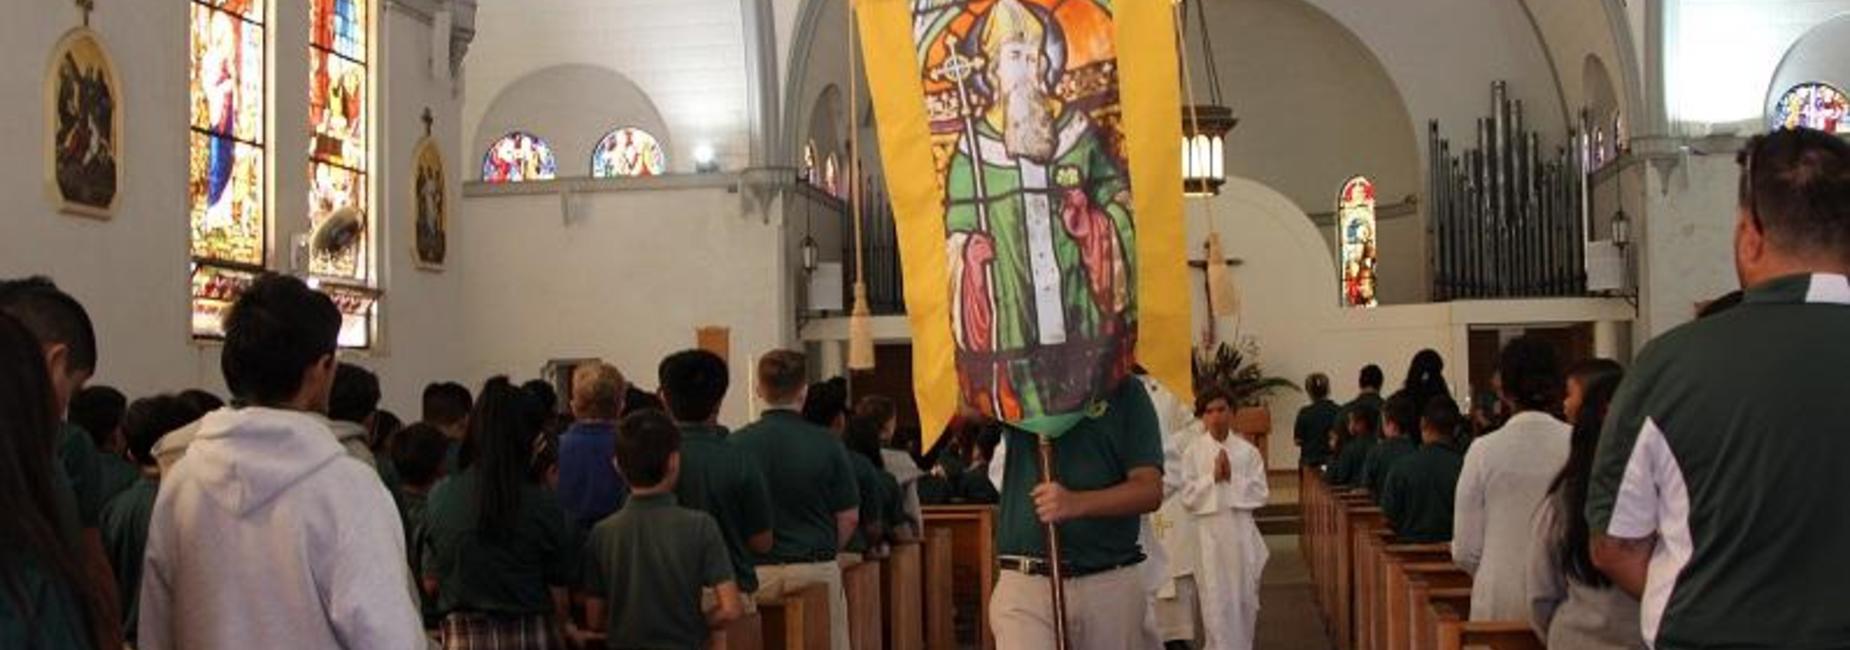 Saint Patrick Church and School